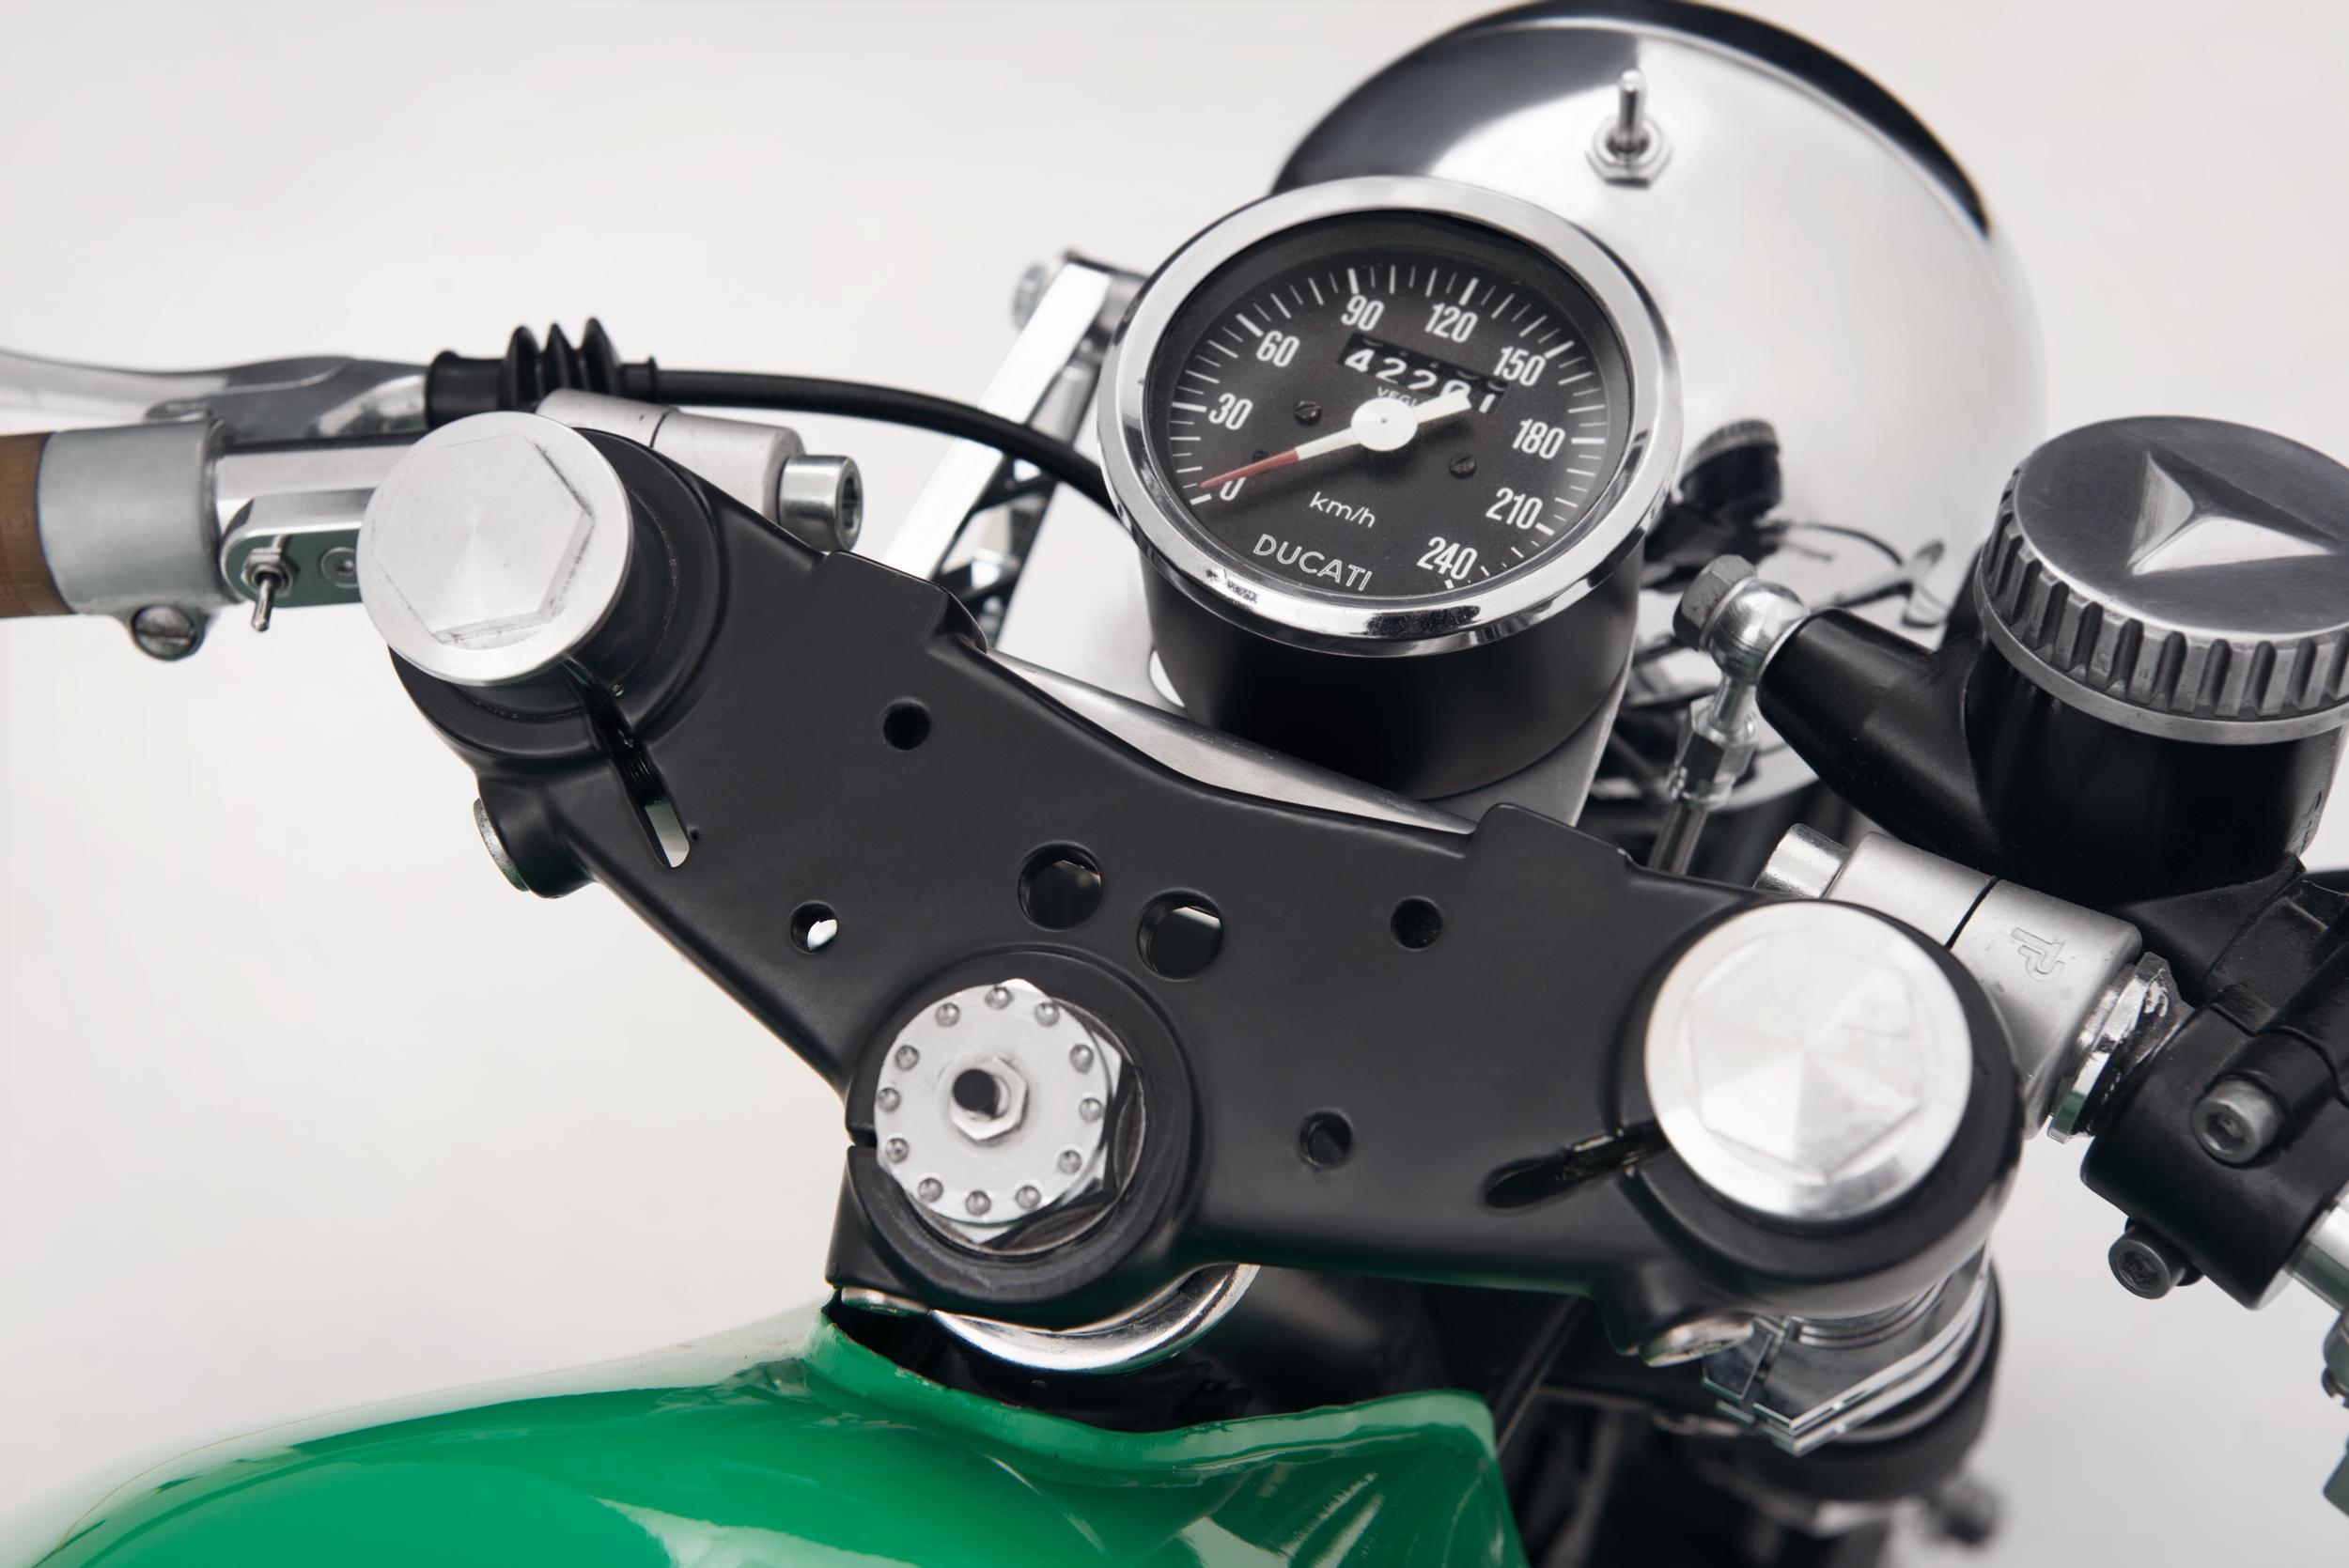 654Motors_Ducati_860_GTS_76_LowRes_06.jpg